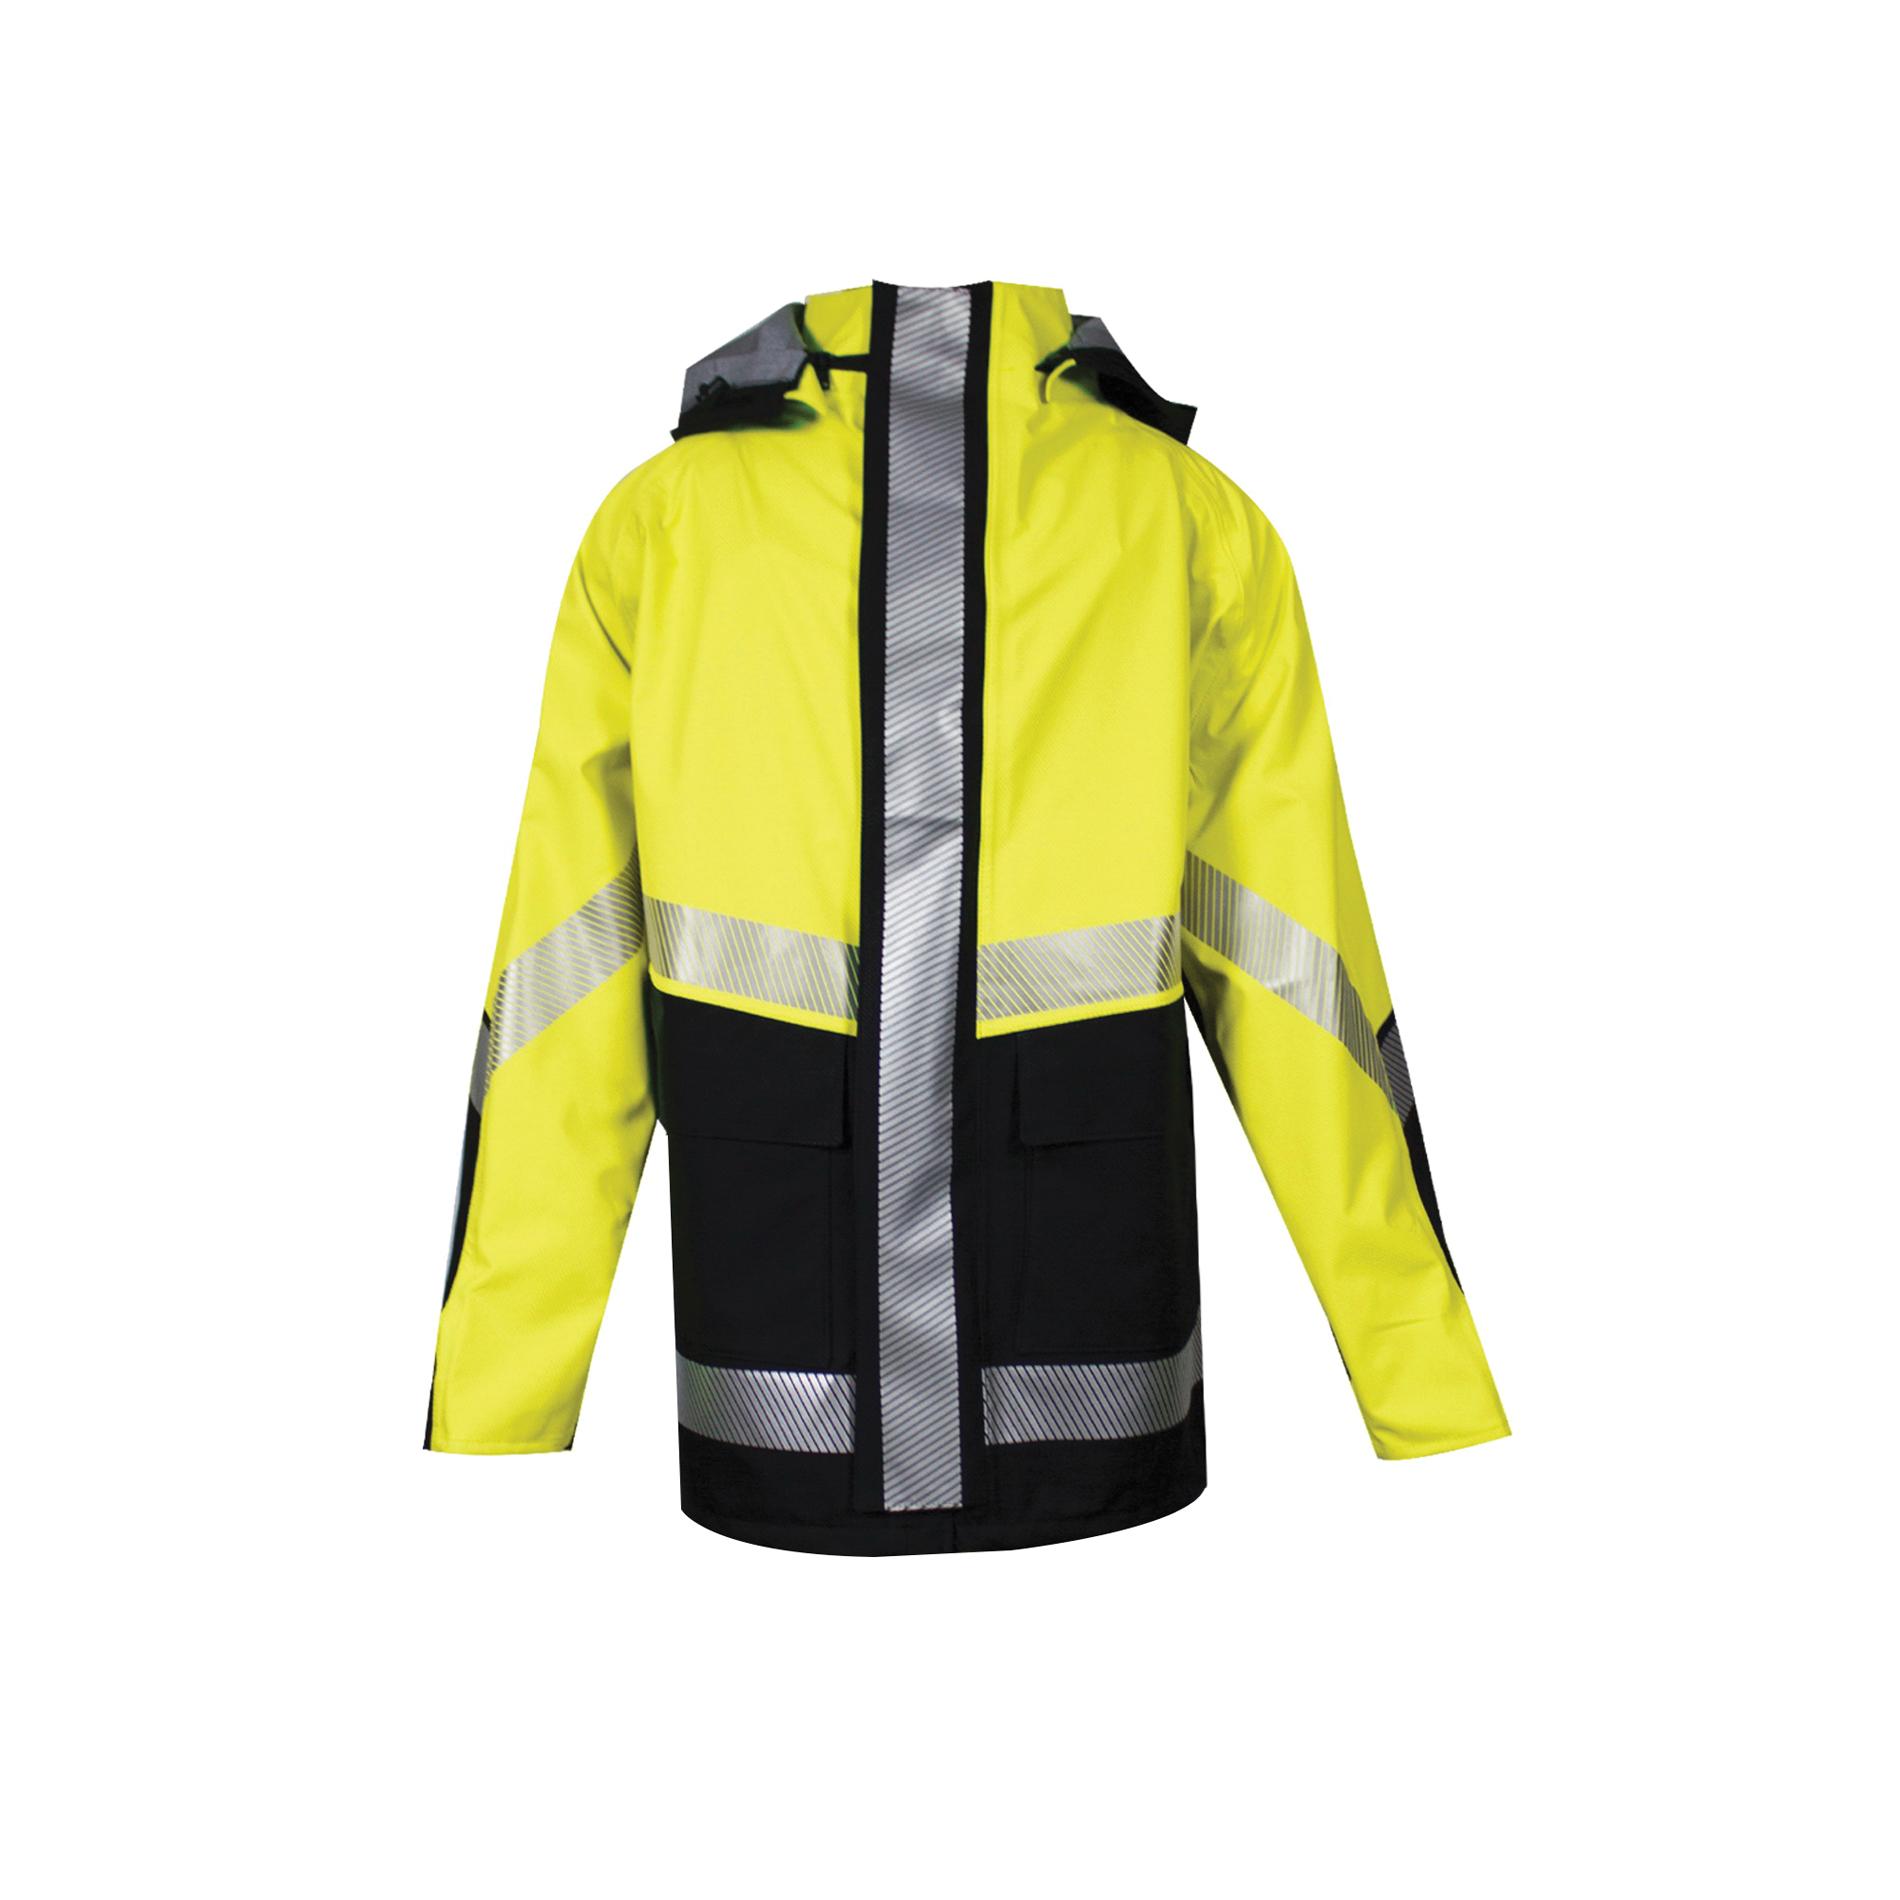 HYDROlite™ HYDROBIBYB-SM HYDROBIBYB Series Flame Resistant Rain Bib Overall, Breathable Hybrid Storm Waterproof, Small, Black/High Visibility Yellow, GORE-TEX® PYRAD® Fabric, Zipper Leg/Snap Fly Closure